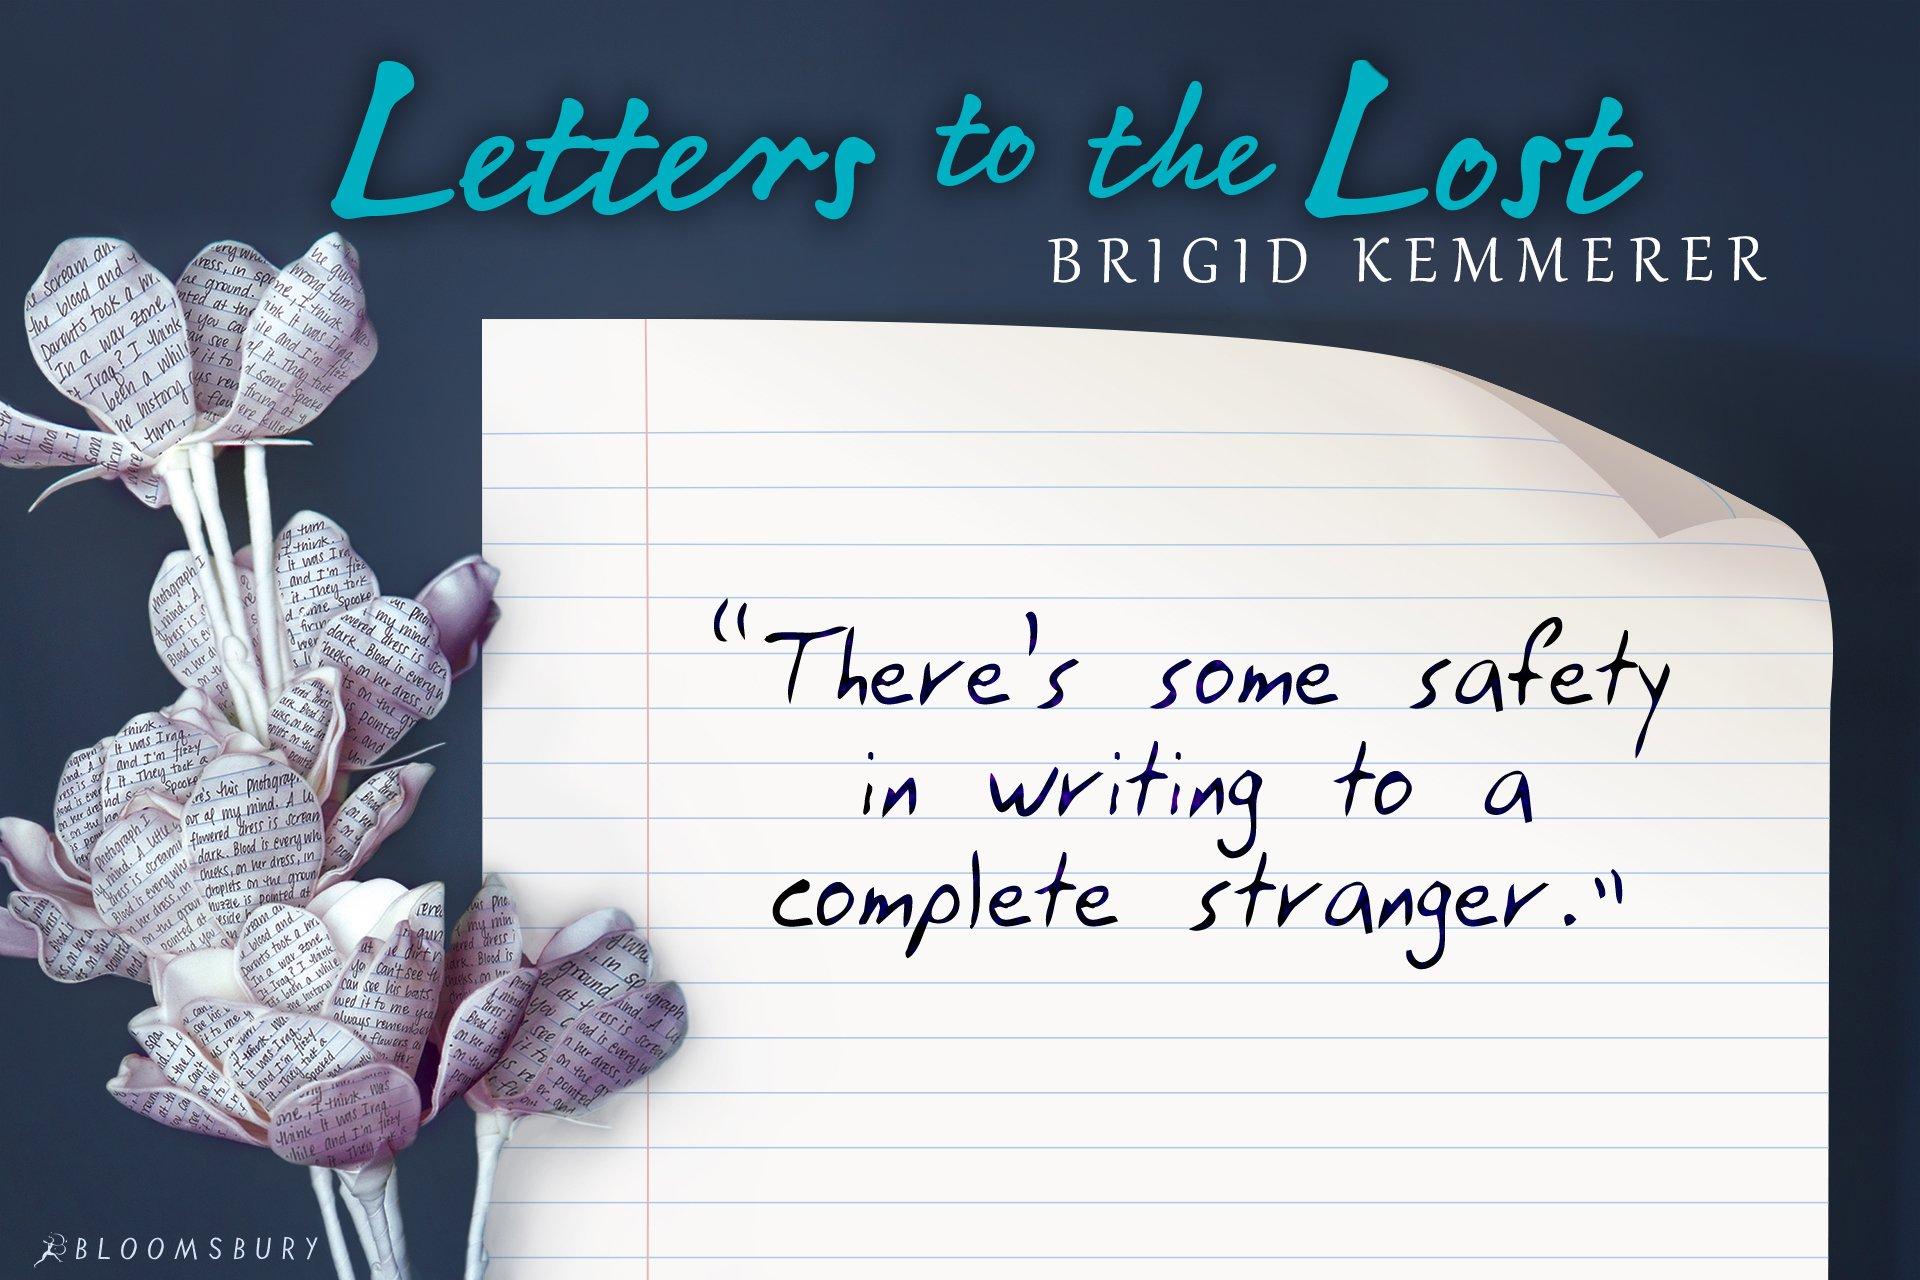 Letters to the Lost: Amazon.de: Brigid Kemmerer: Fremdsprachige Bücher